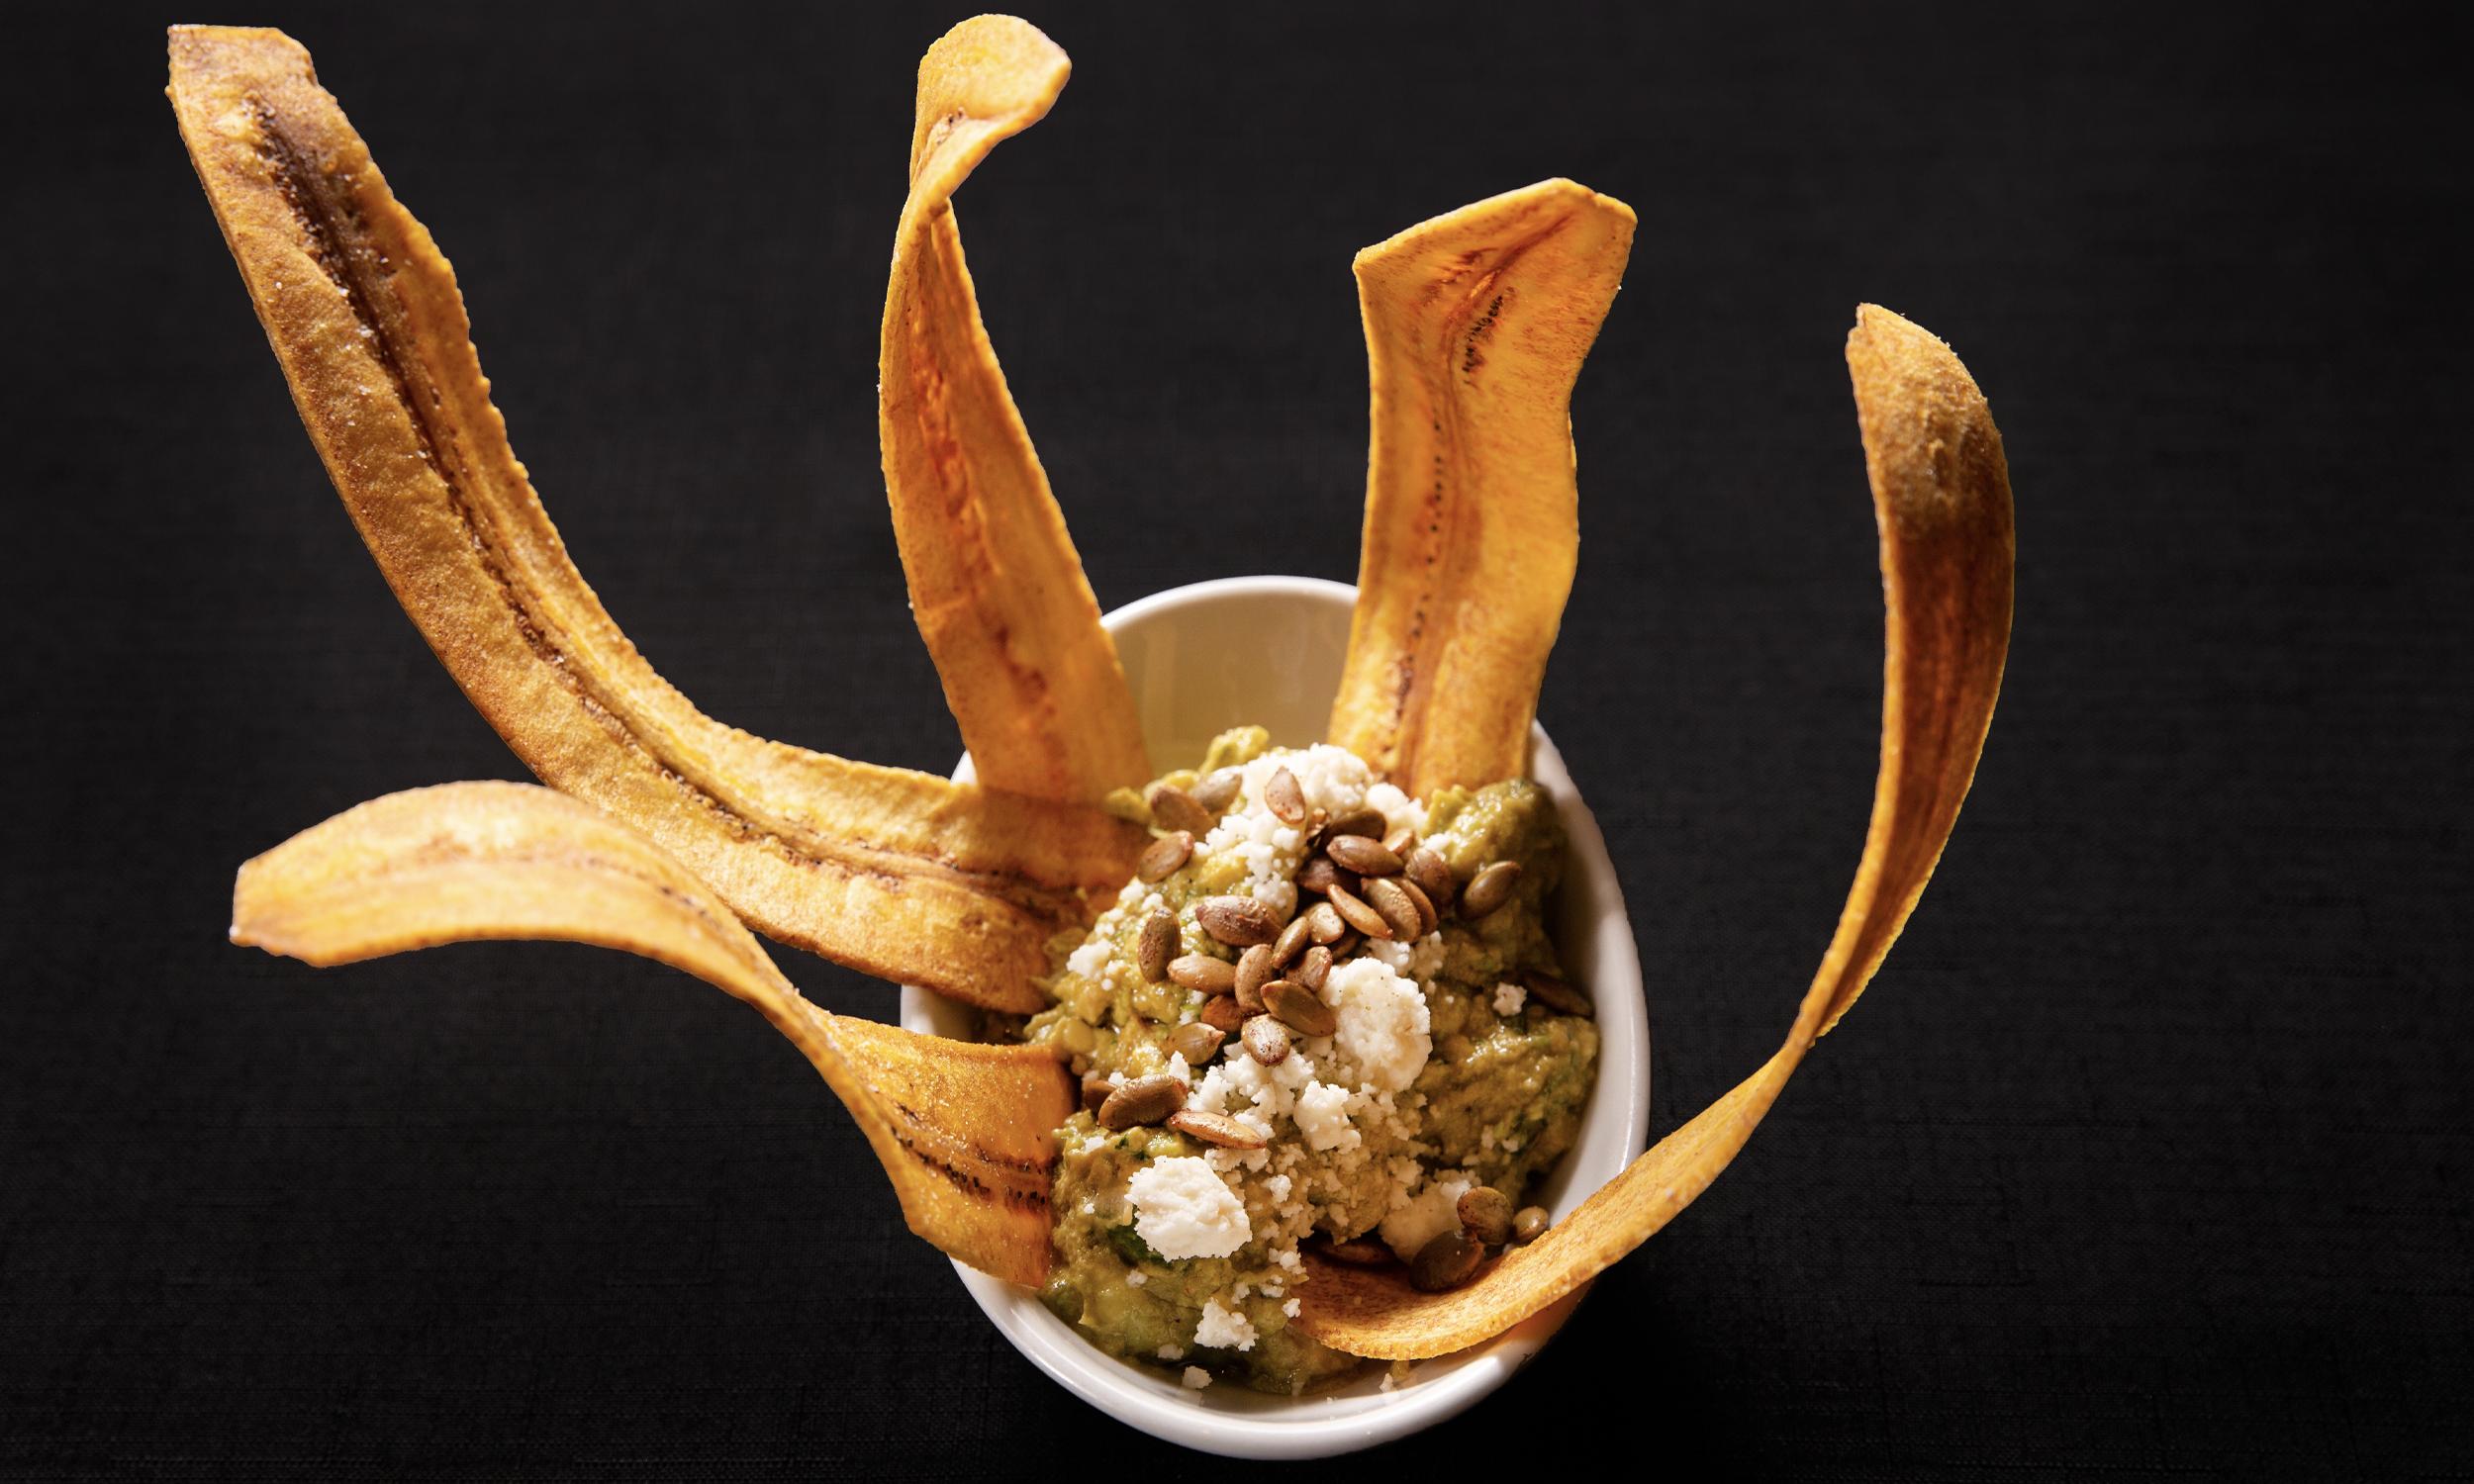 Crispy Green Plantain Chips & Guacamole